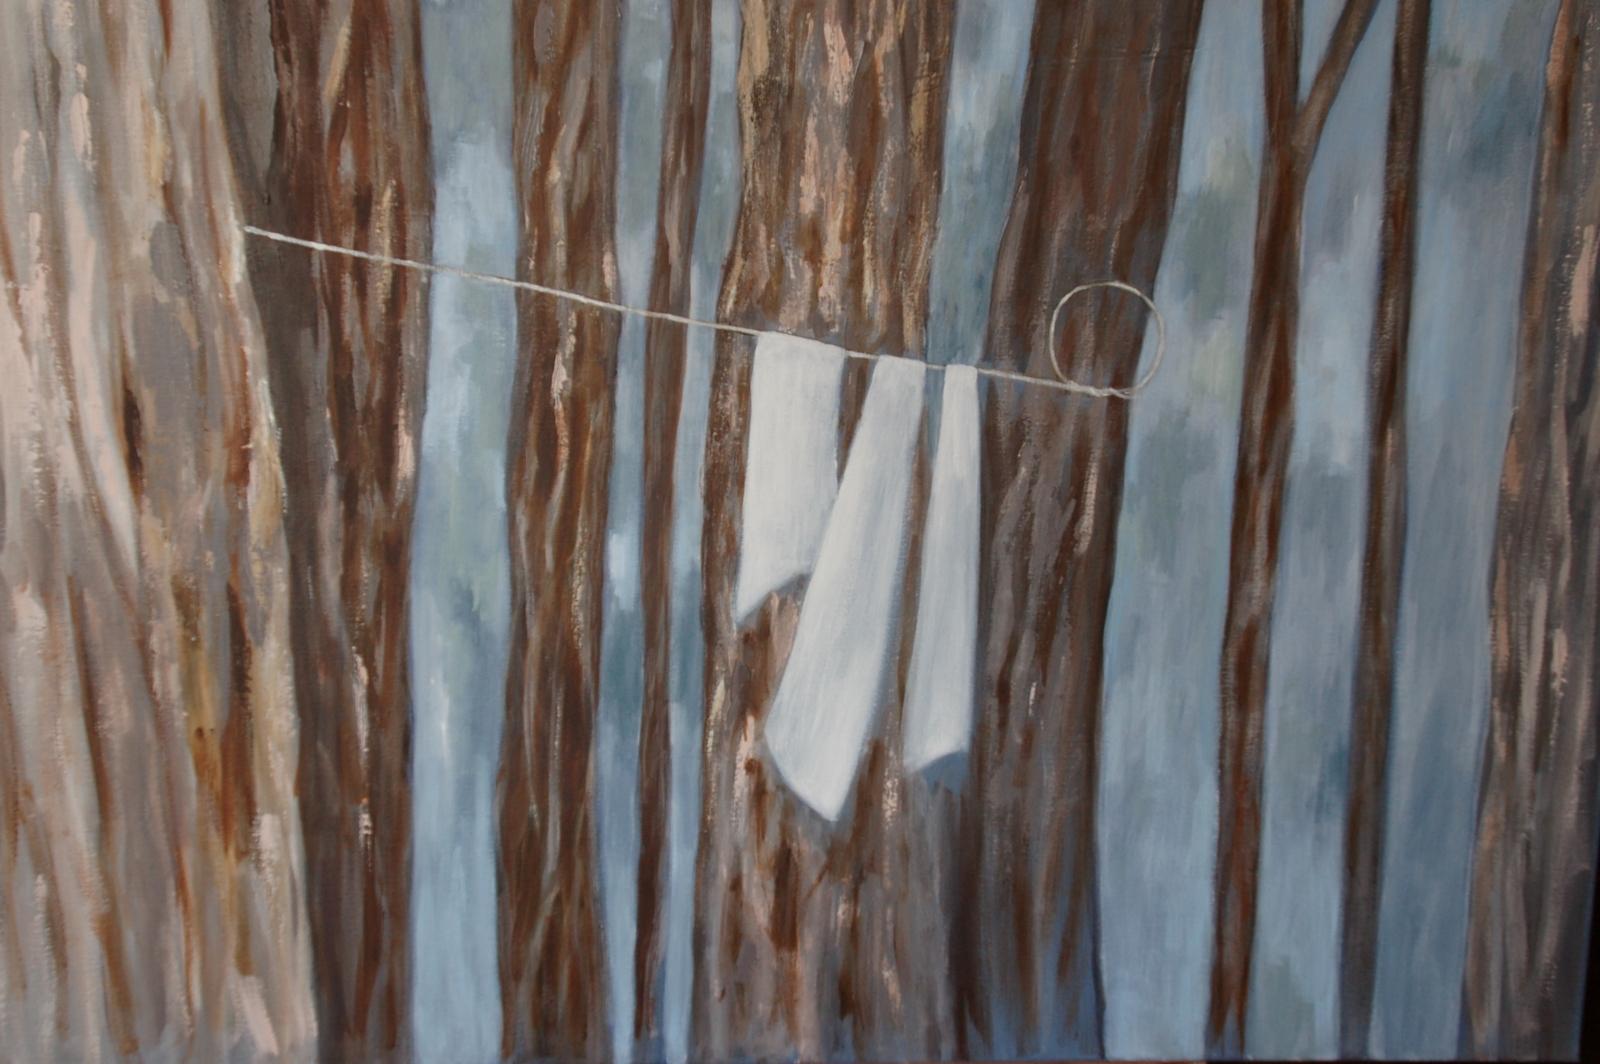 Roz Esplin, Mercy, 2009, acrylic on canvas, 122.5cm x 97cm image